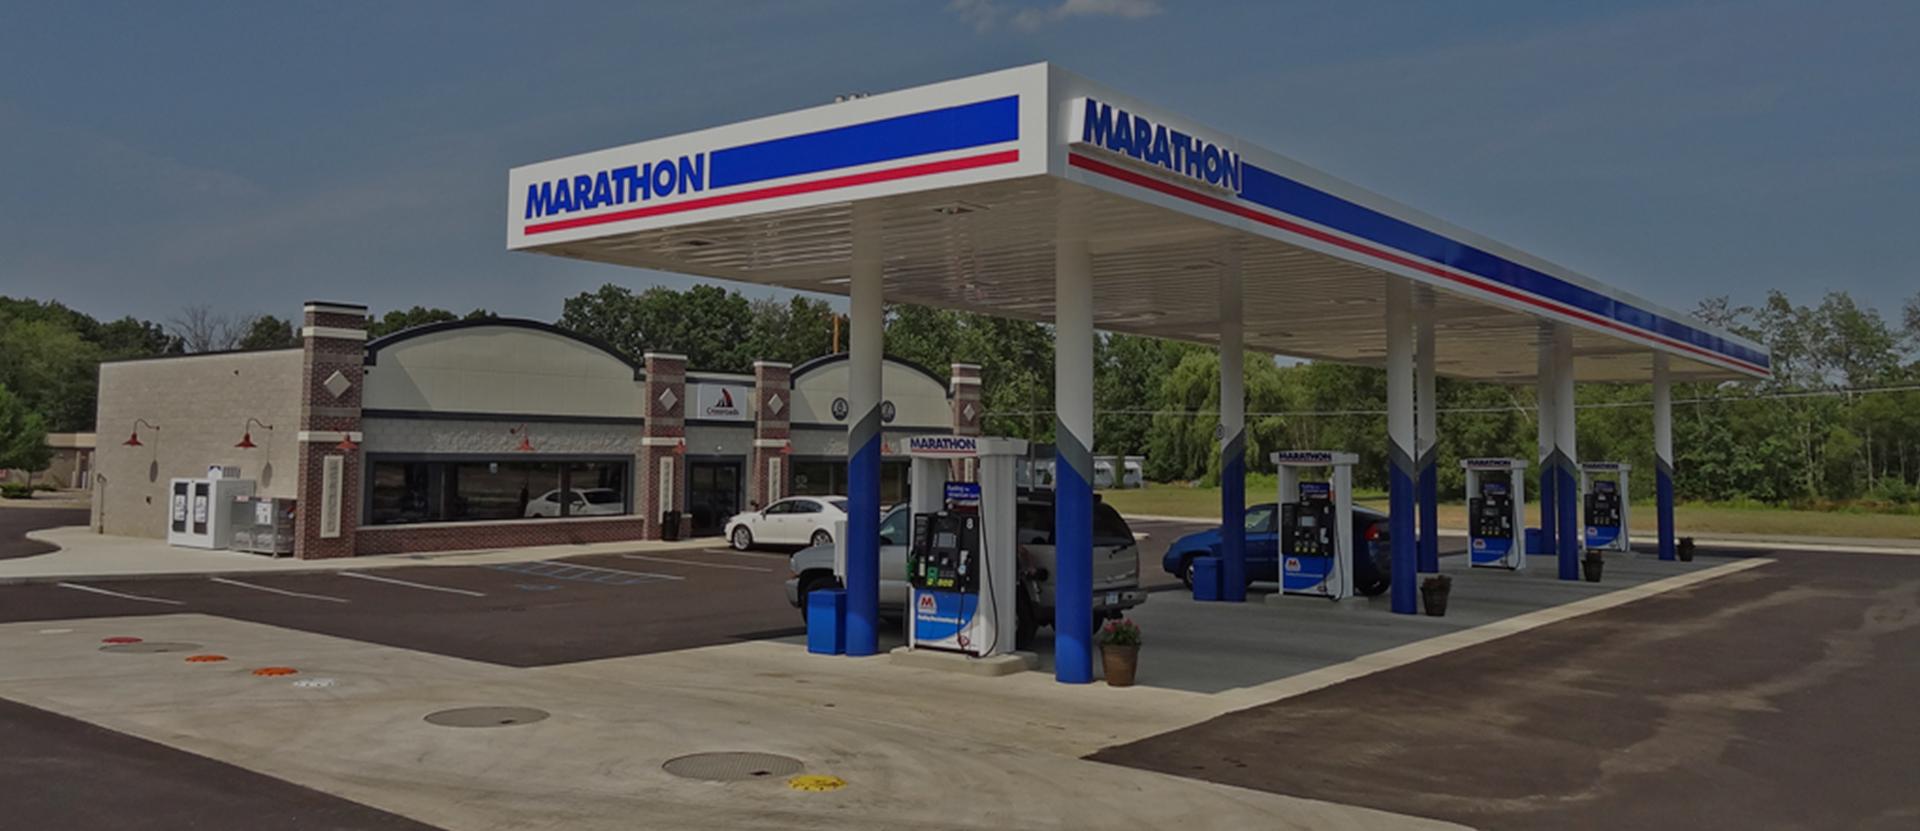 Marathon-Gilbarco-dispensers